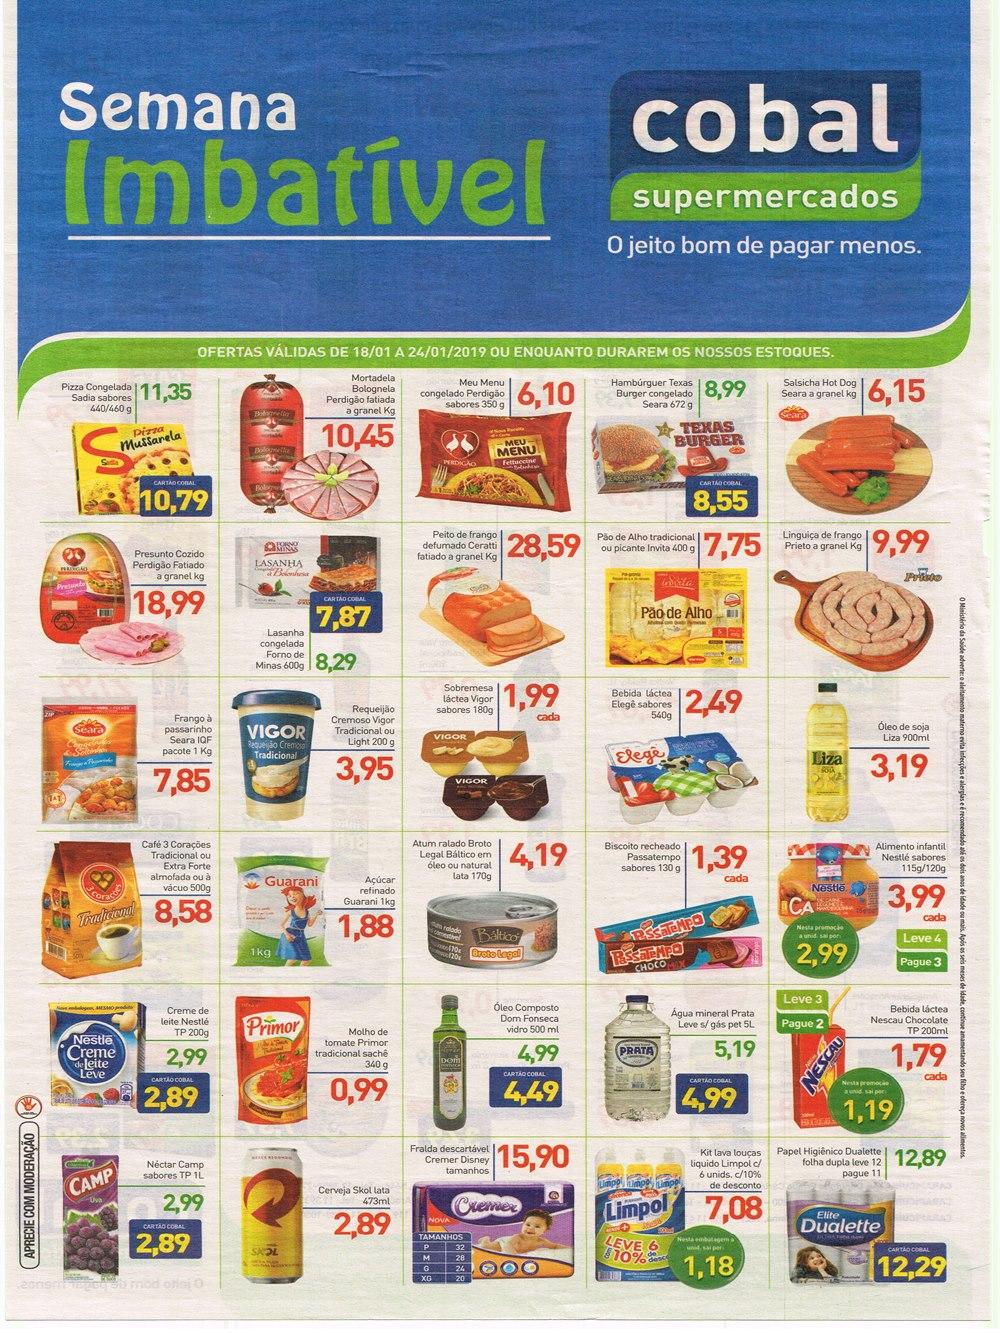 supermercados_0002 Ofertas de Supermercados - Economize!